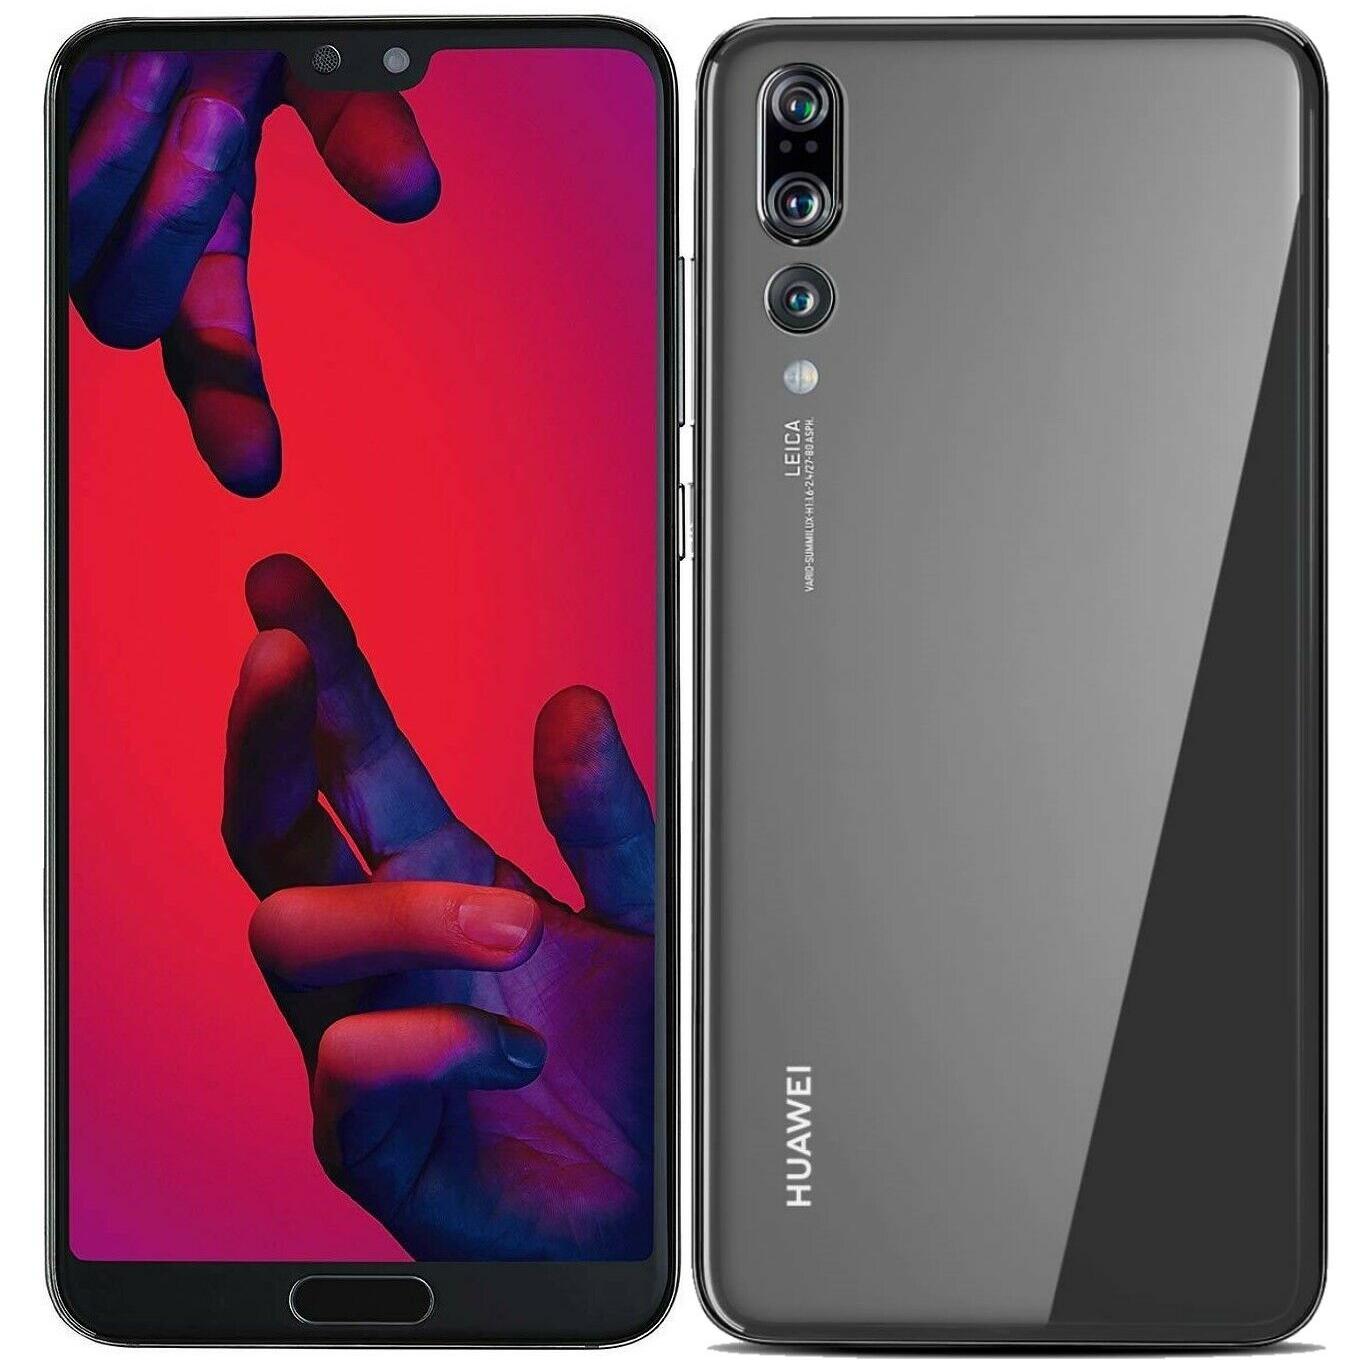 Huawei P20 Pro 128GB 6GB RAM Unlocked - (Black) Manufacturer refurbished B+ - £255.03 @ cheapest_electrical ebay